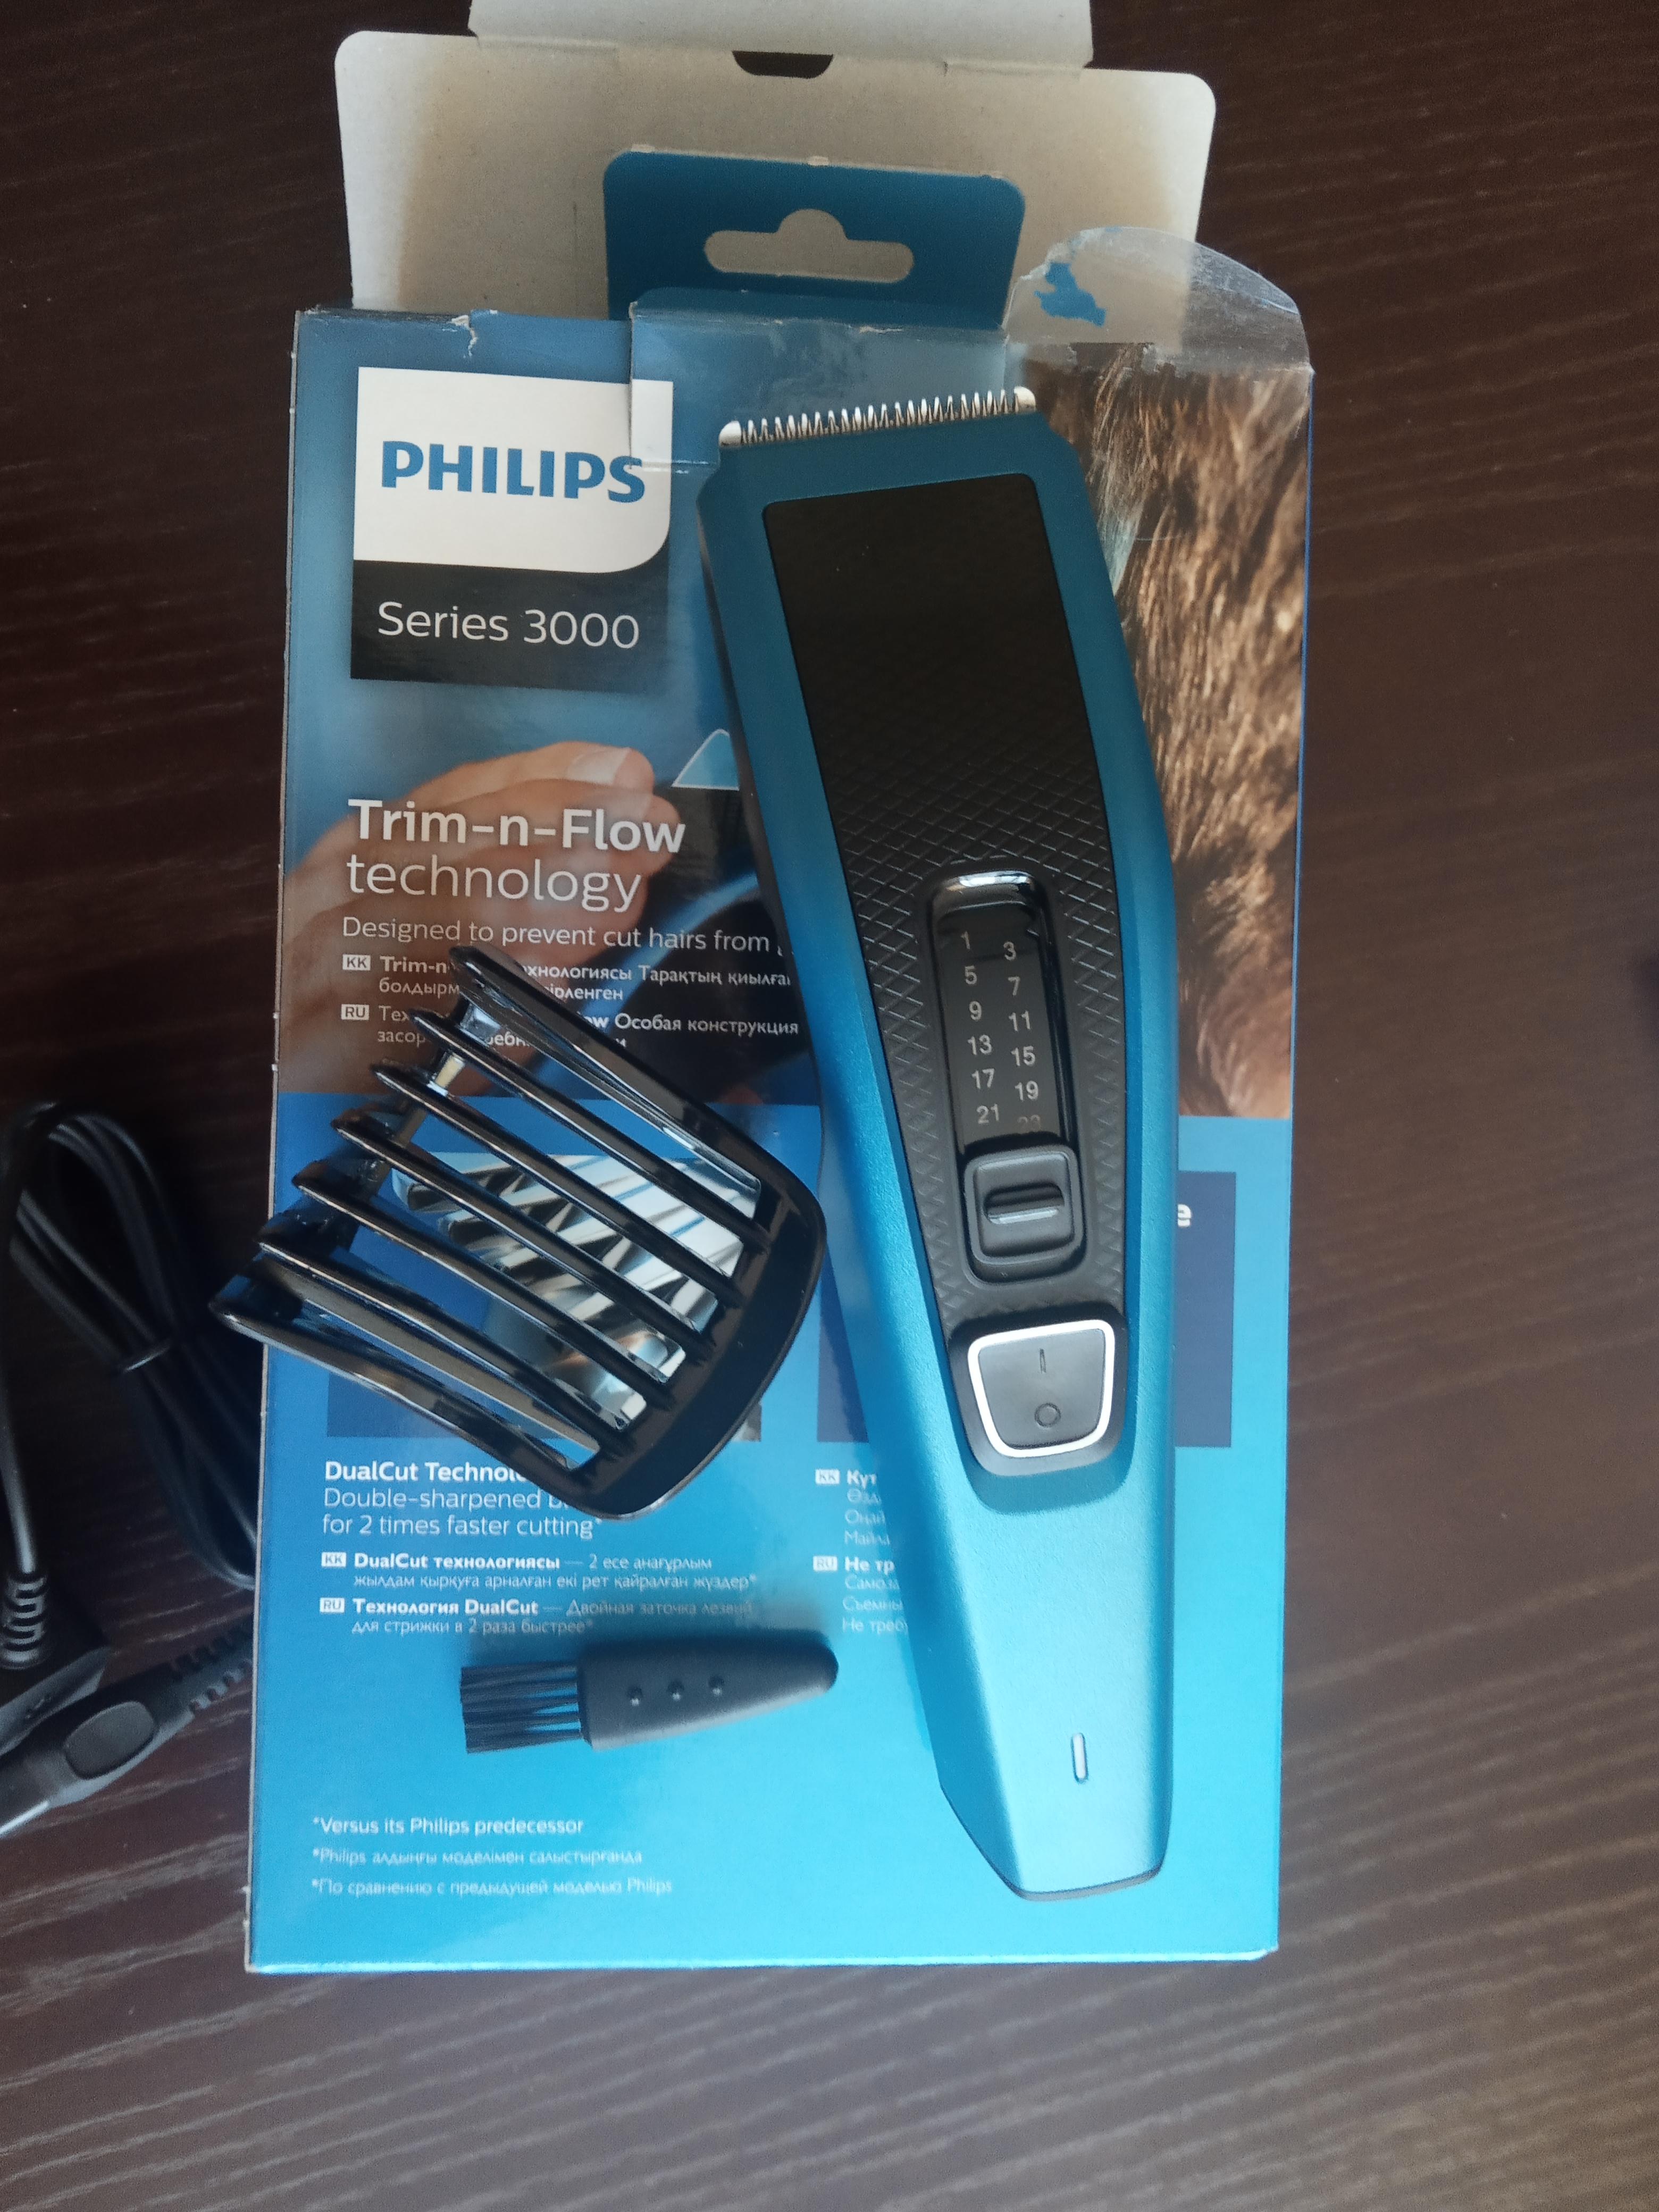 Видеообзор машинки для стрижки волос Philips HC3522/15 Hairclipper Series 3000